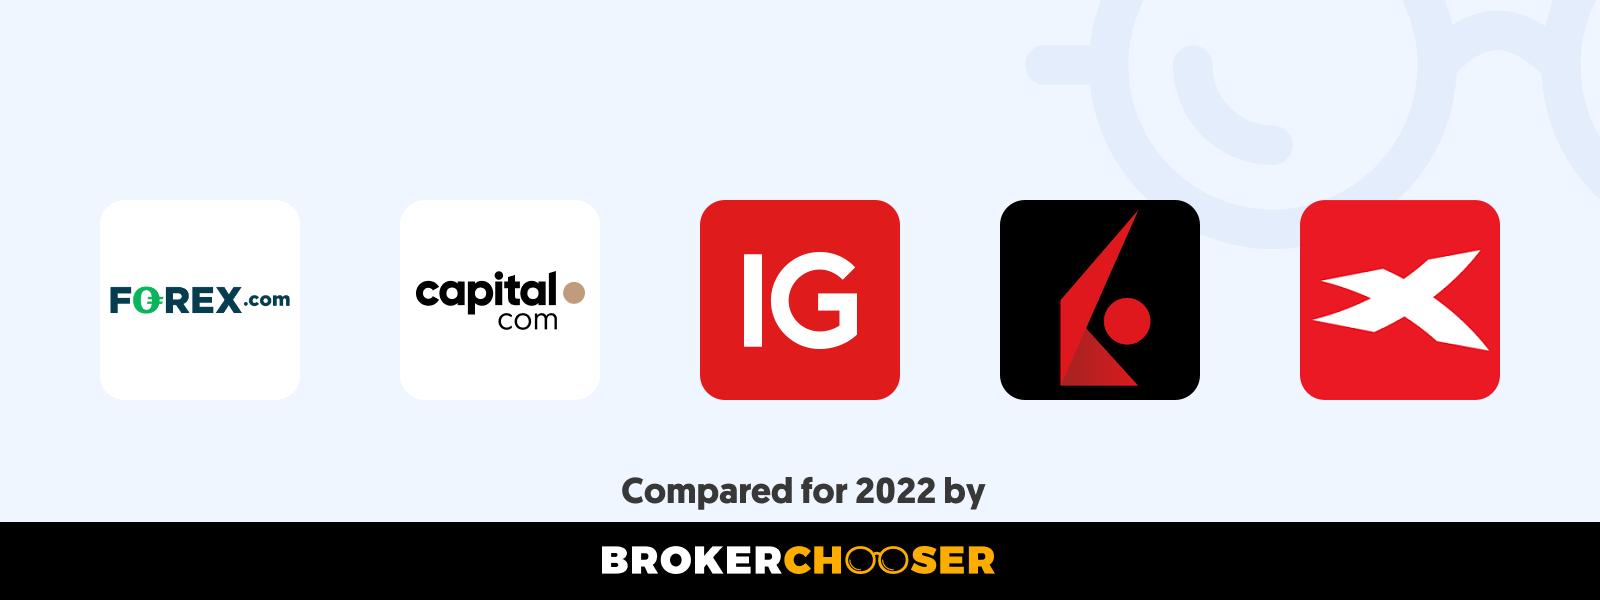 Best forex brokers for beginners in Guinea-Bissau in 2021